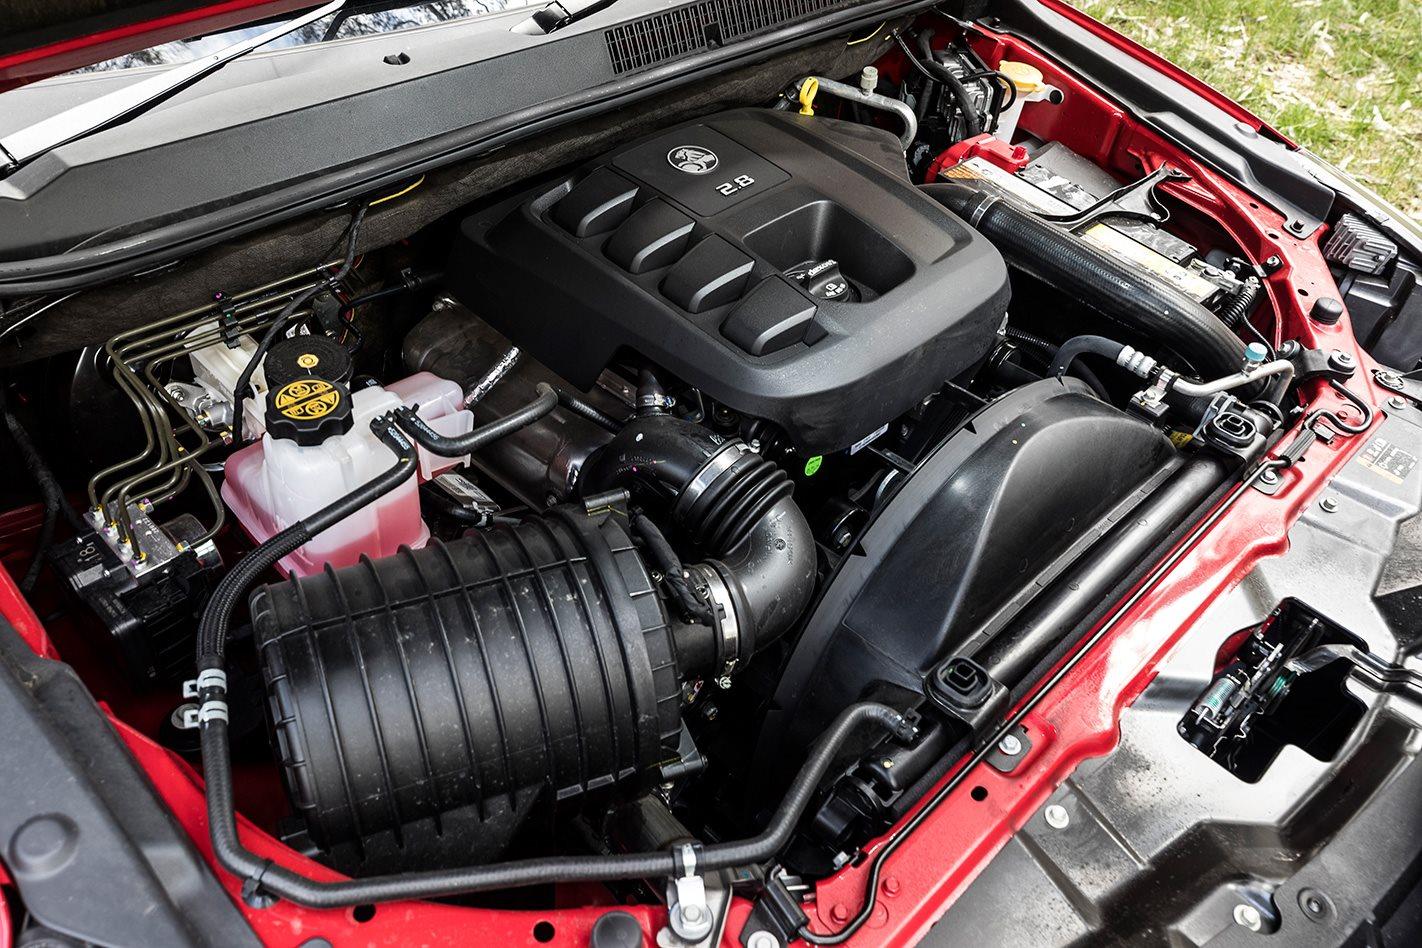 Holden Colorado Z71 engine.jpg